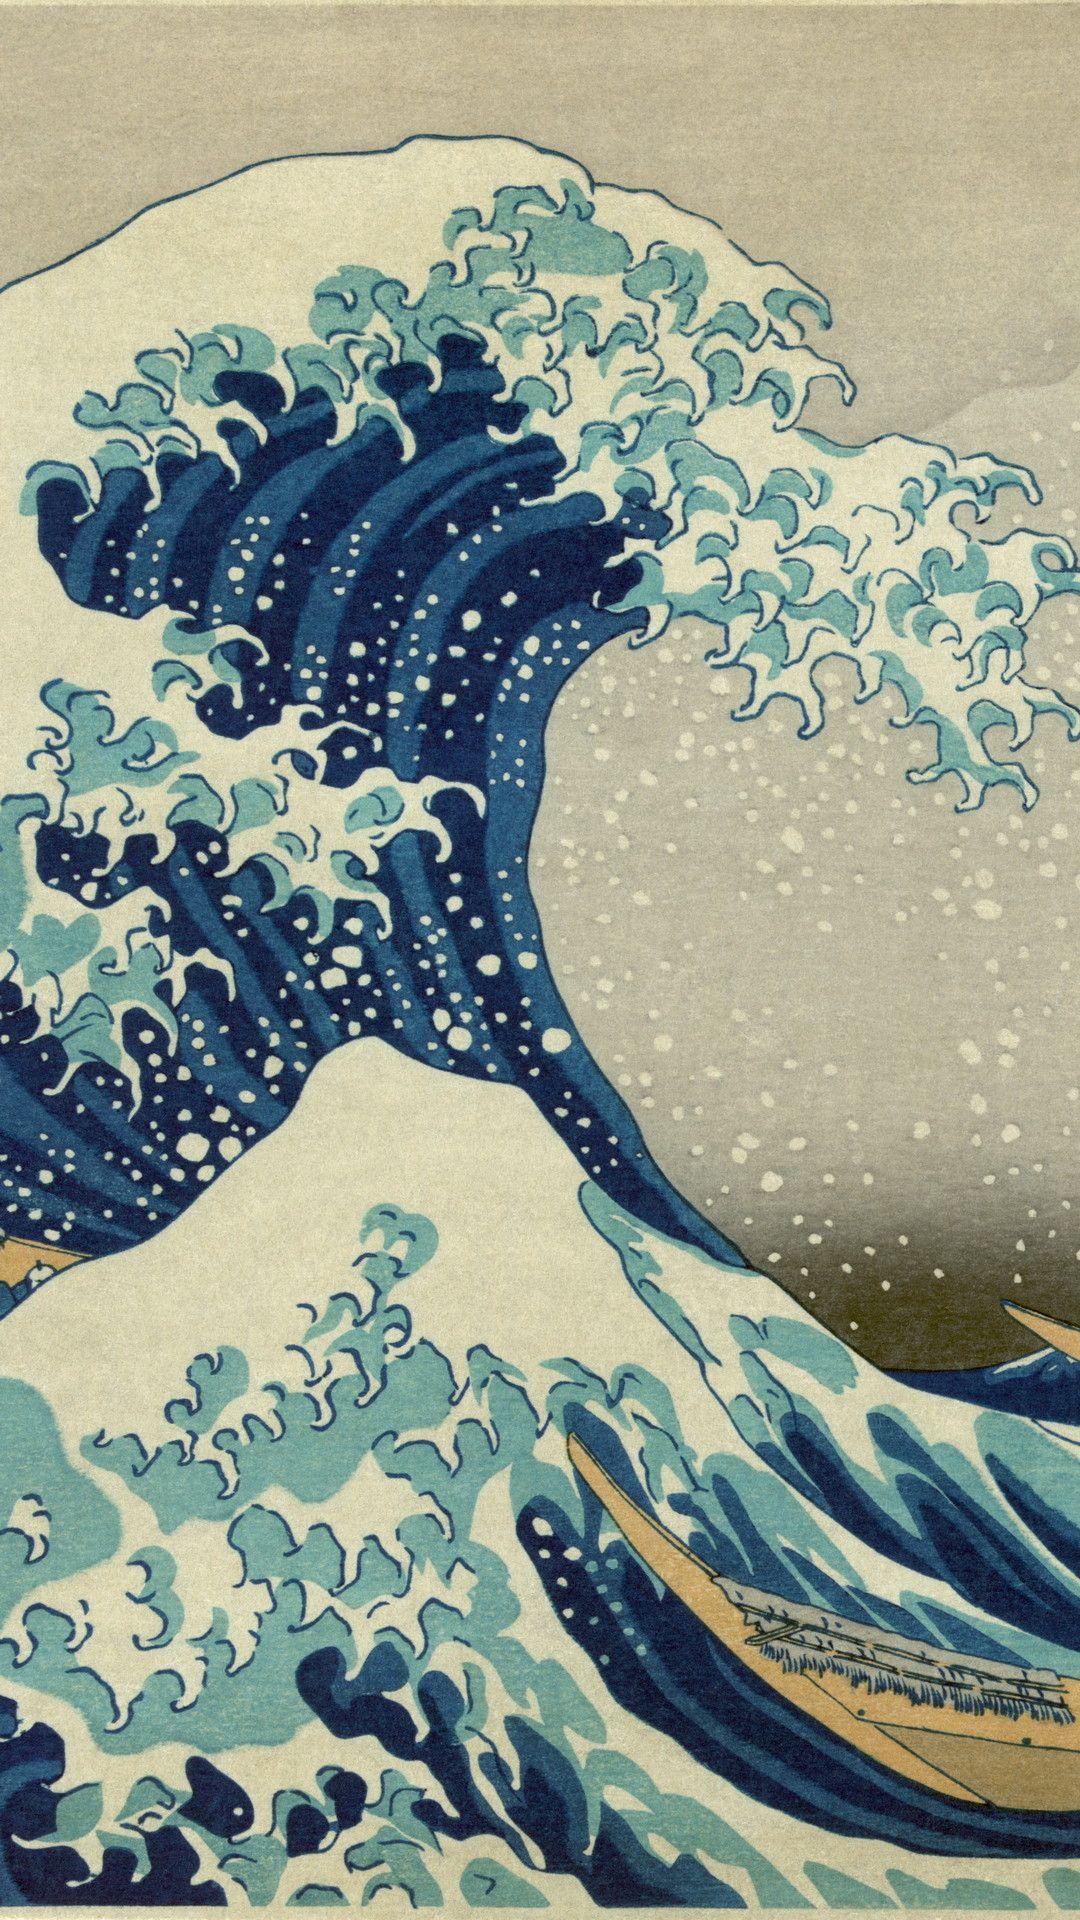 Katsushika Hokusai | Japan Art IPhone Wallpapers | IPhone Wallpaper